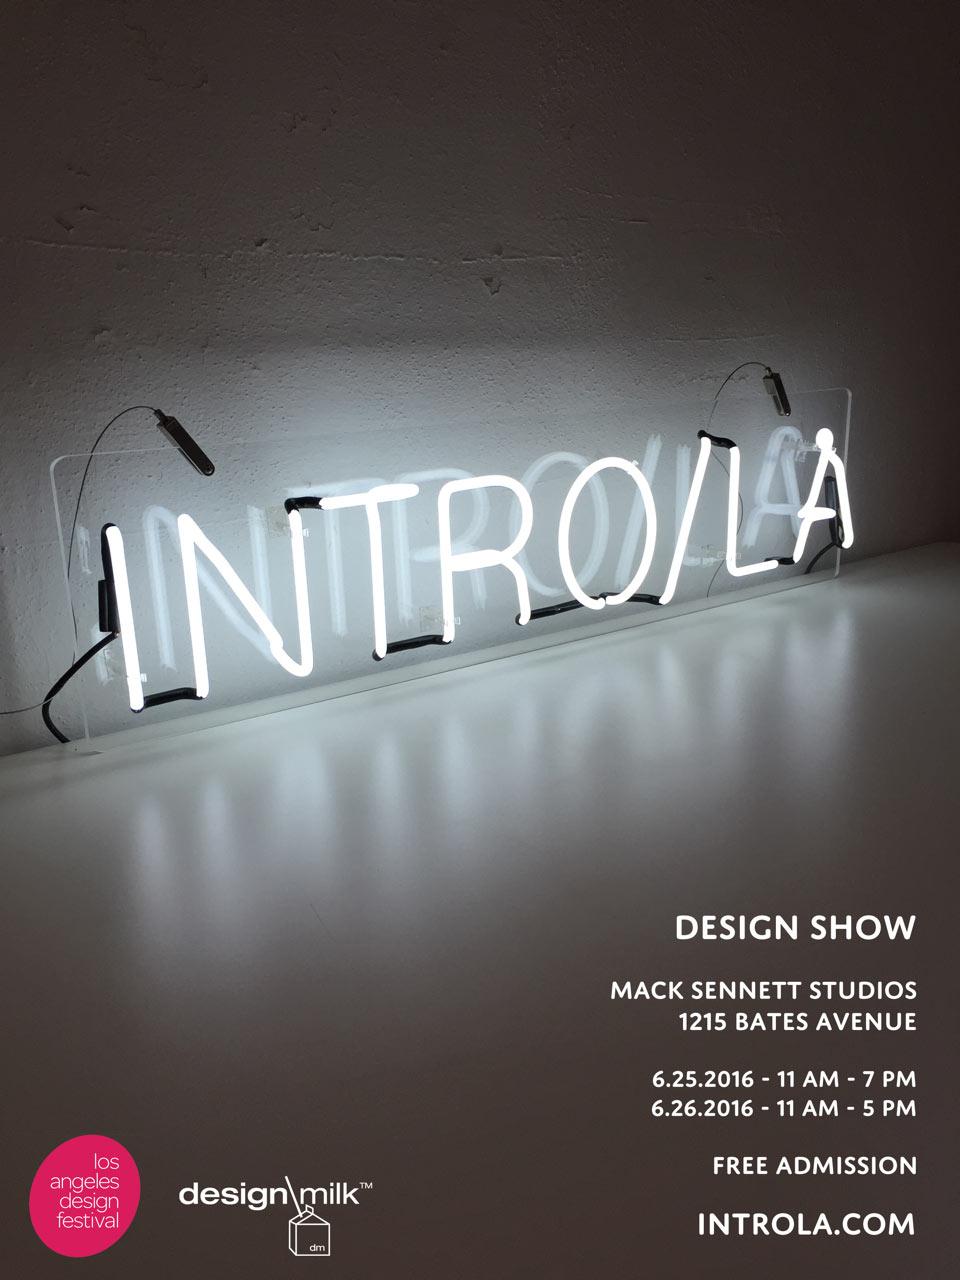 INTRO/LA 2016: West Coast Design